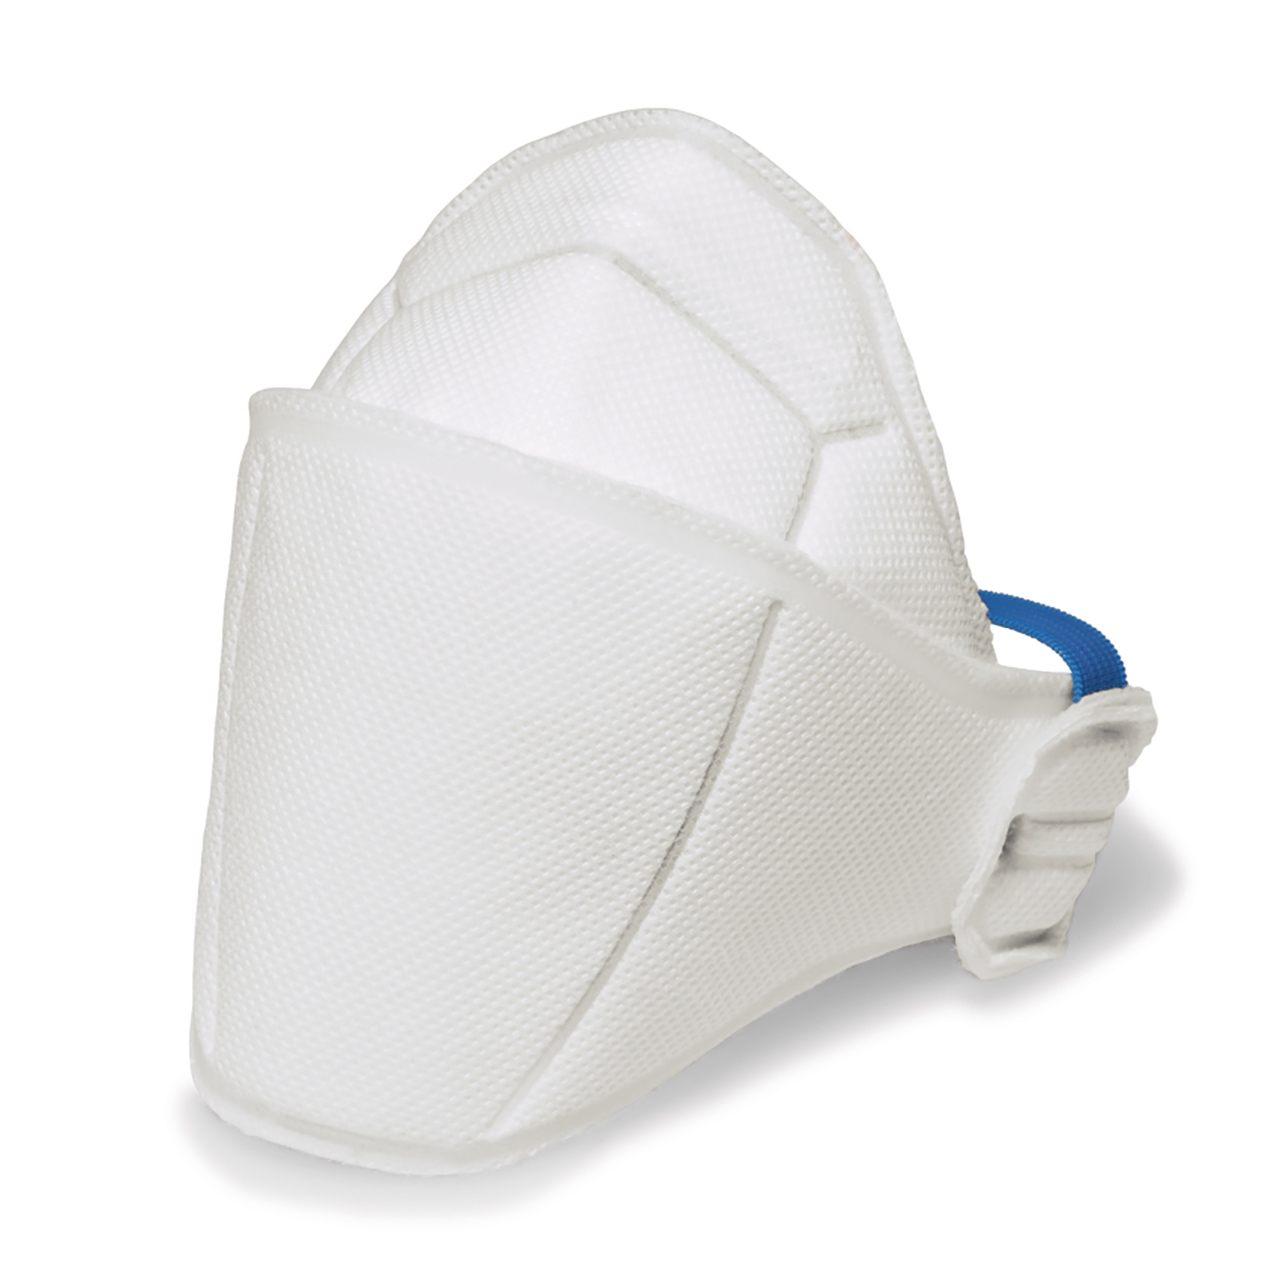 Masker Antivirus Terbaik dari uvex - uvex Silv-Air 5100 Premium FFP1